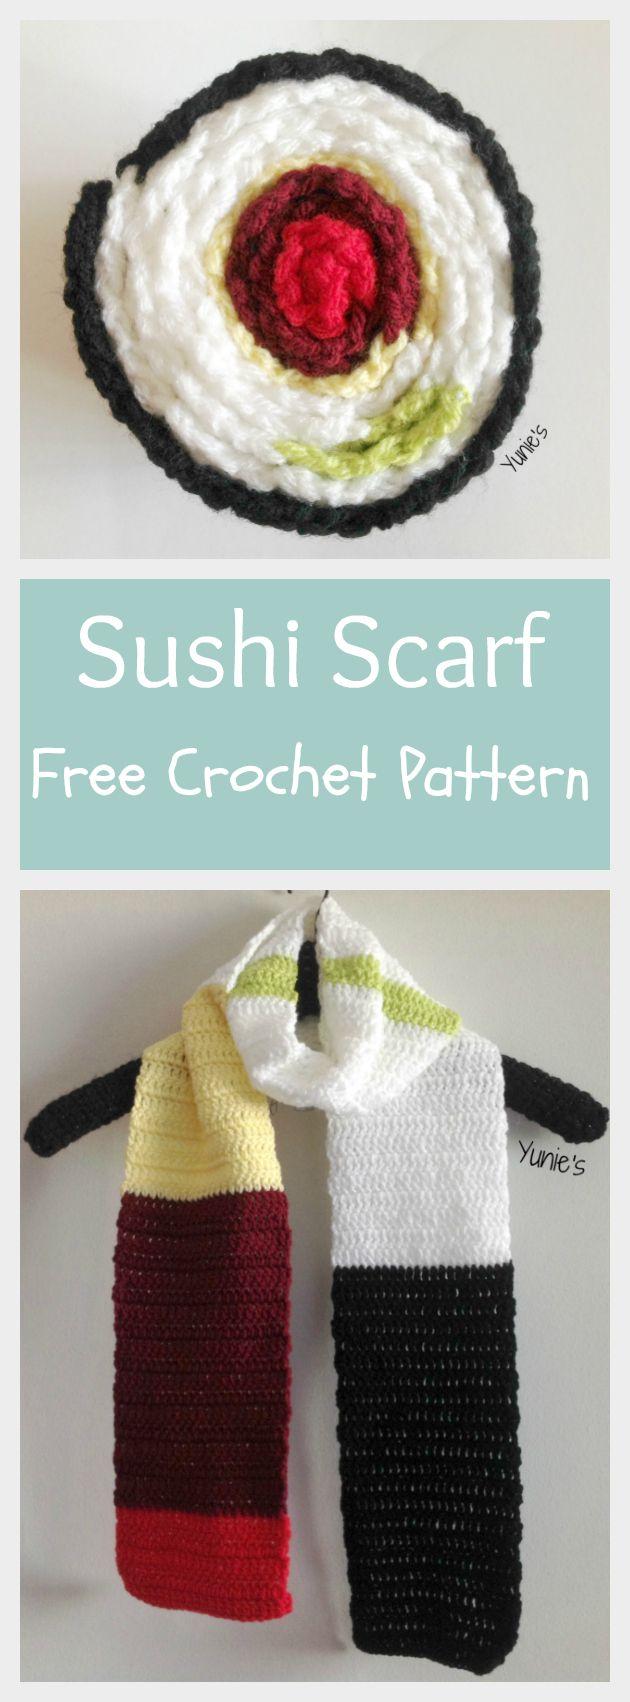 Free Crochet Pattern: Sushi Scarf | Gift ideas | Pinterest | Sushi ...